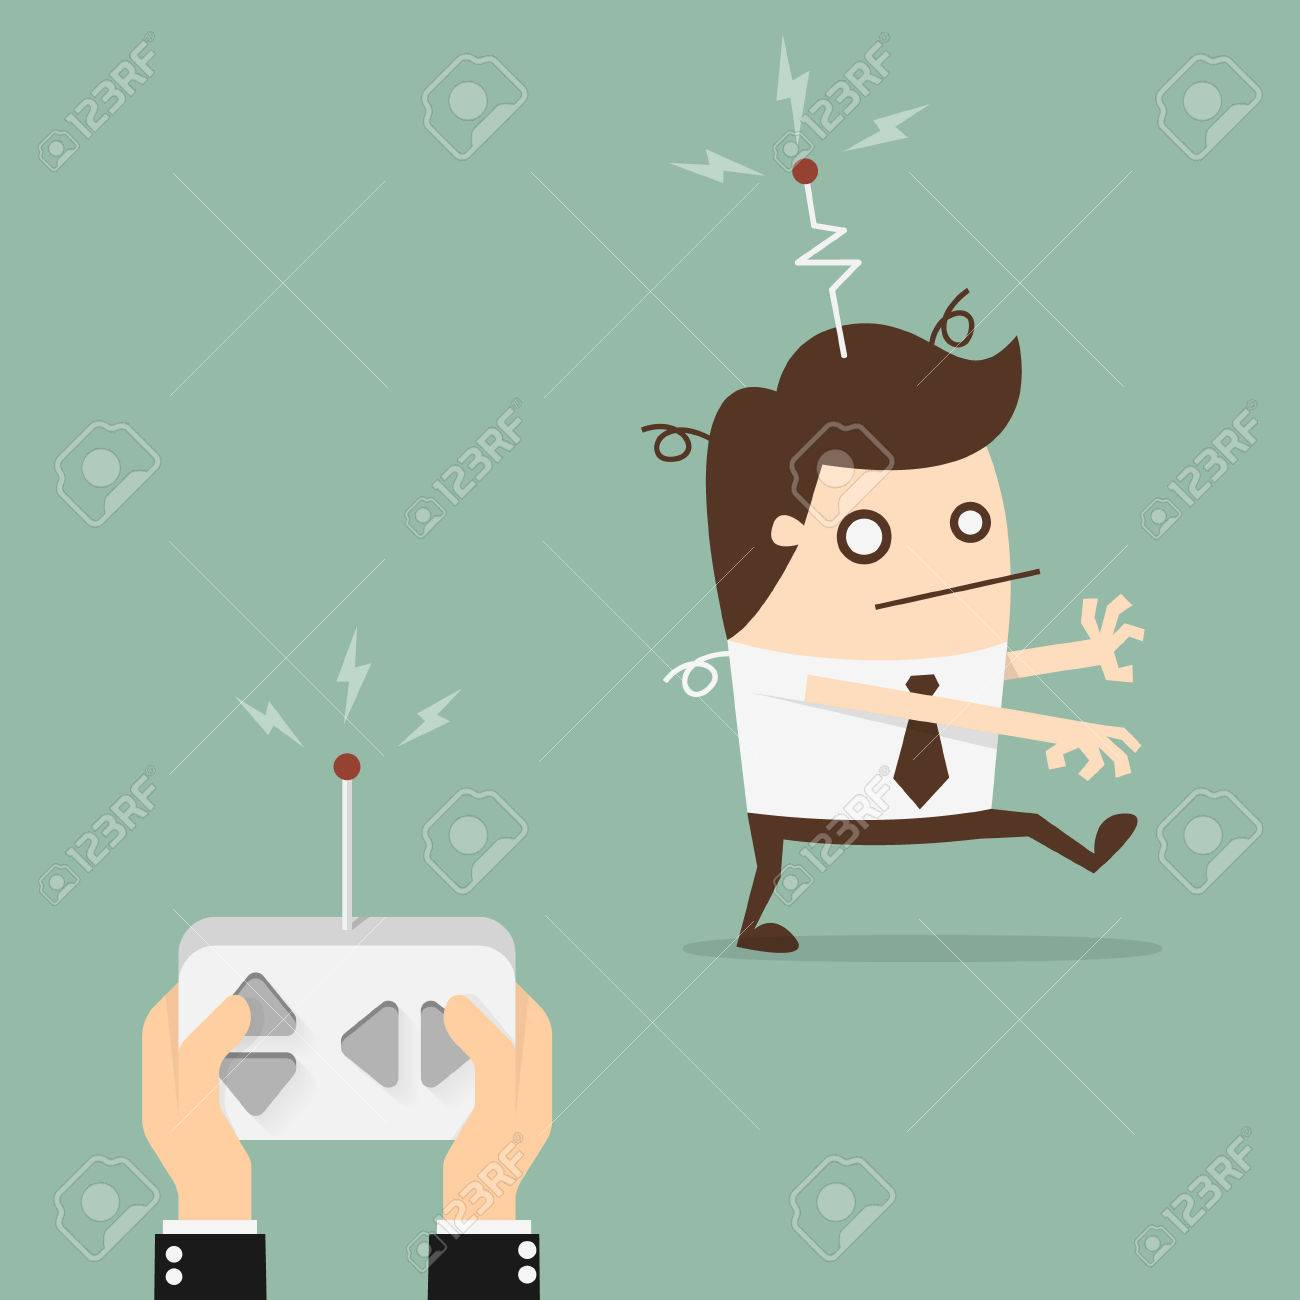 Remote control businessman - 52631369